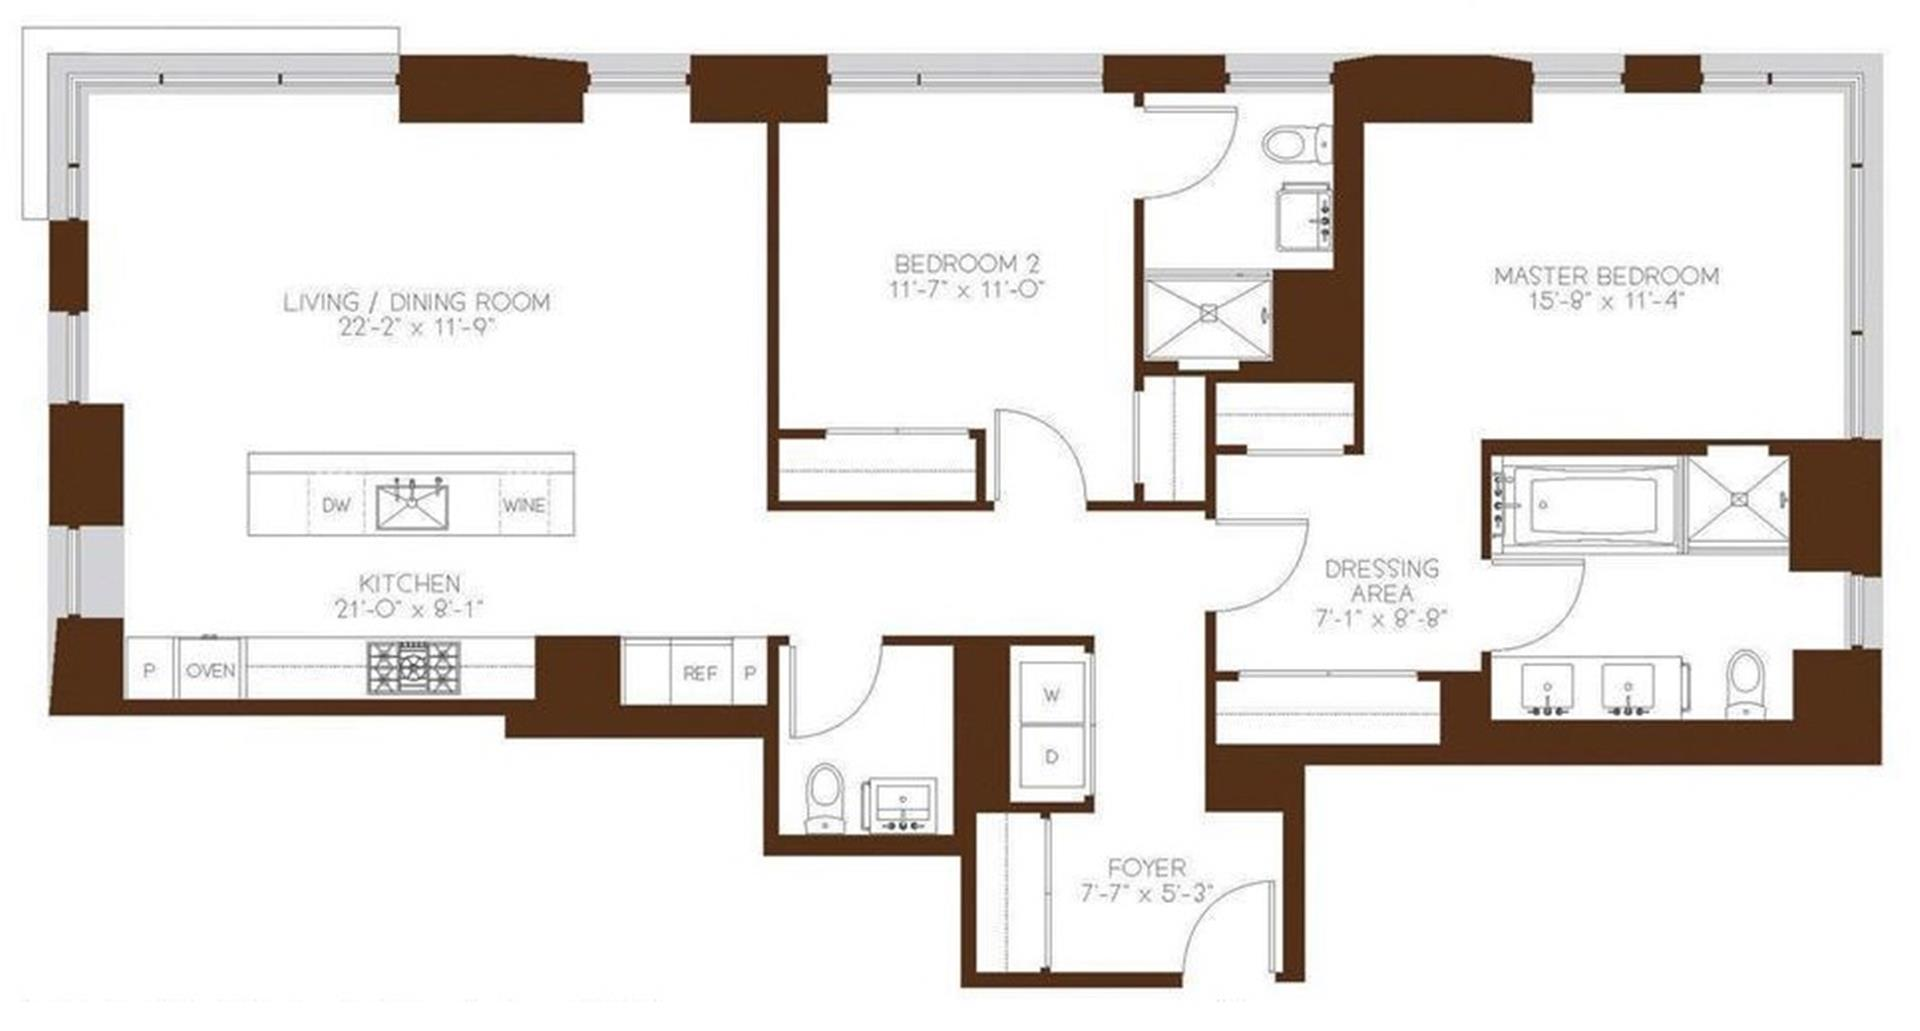 Floor plan of 301 East 50th St, 9C - Turtle Bay, New York